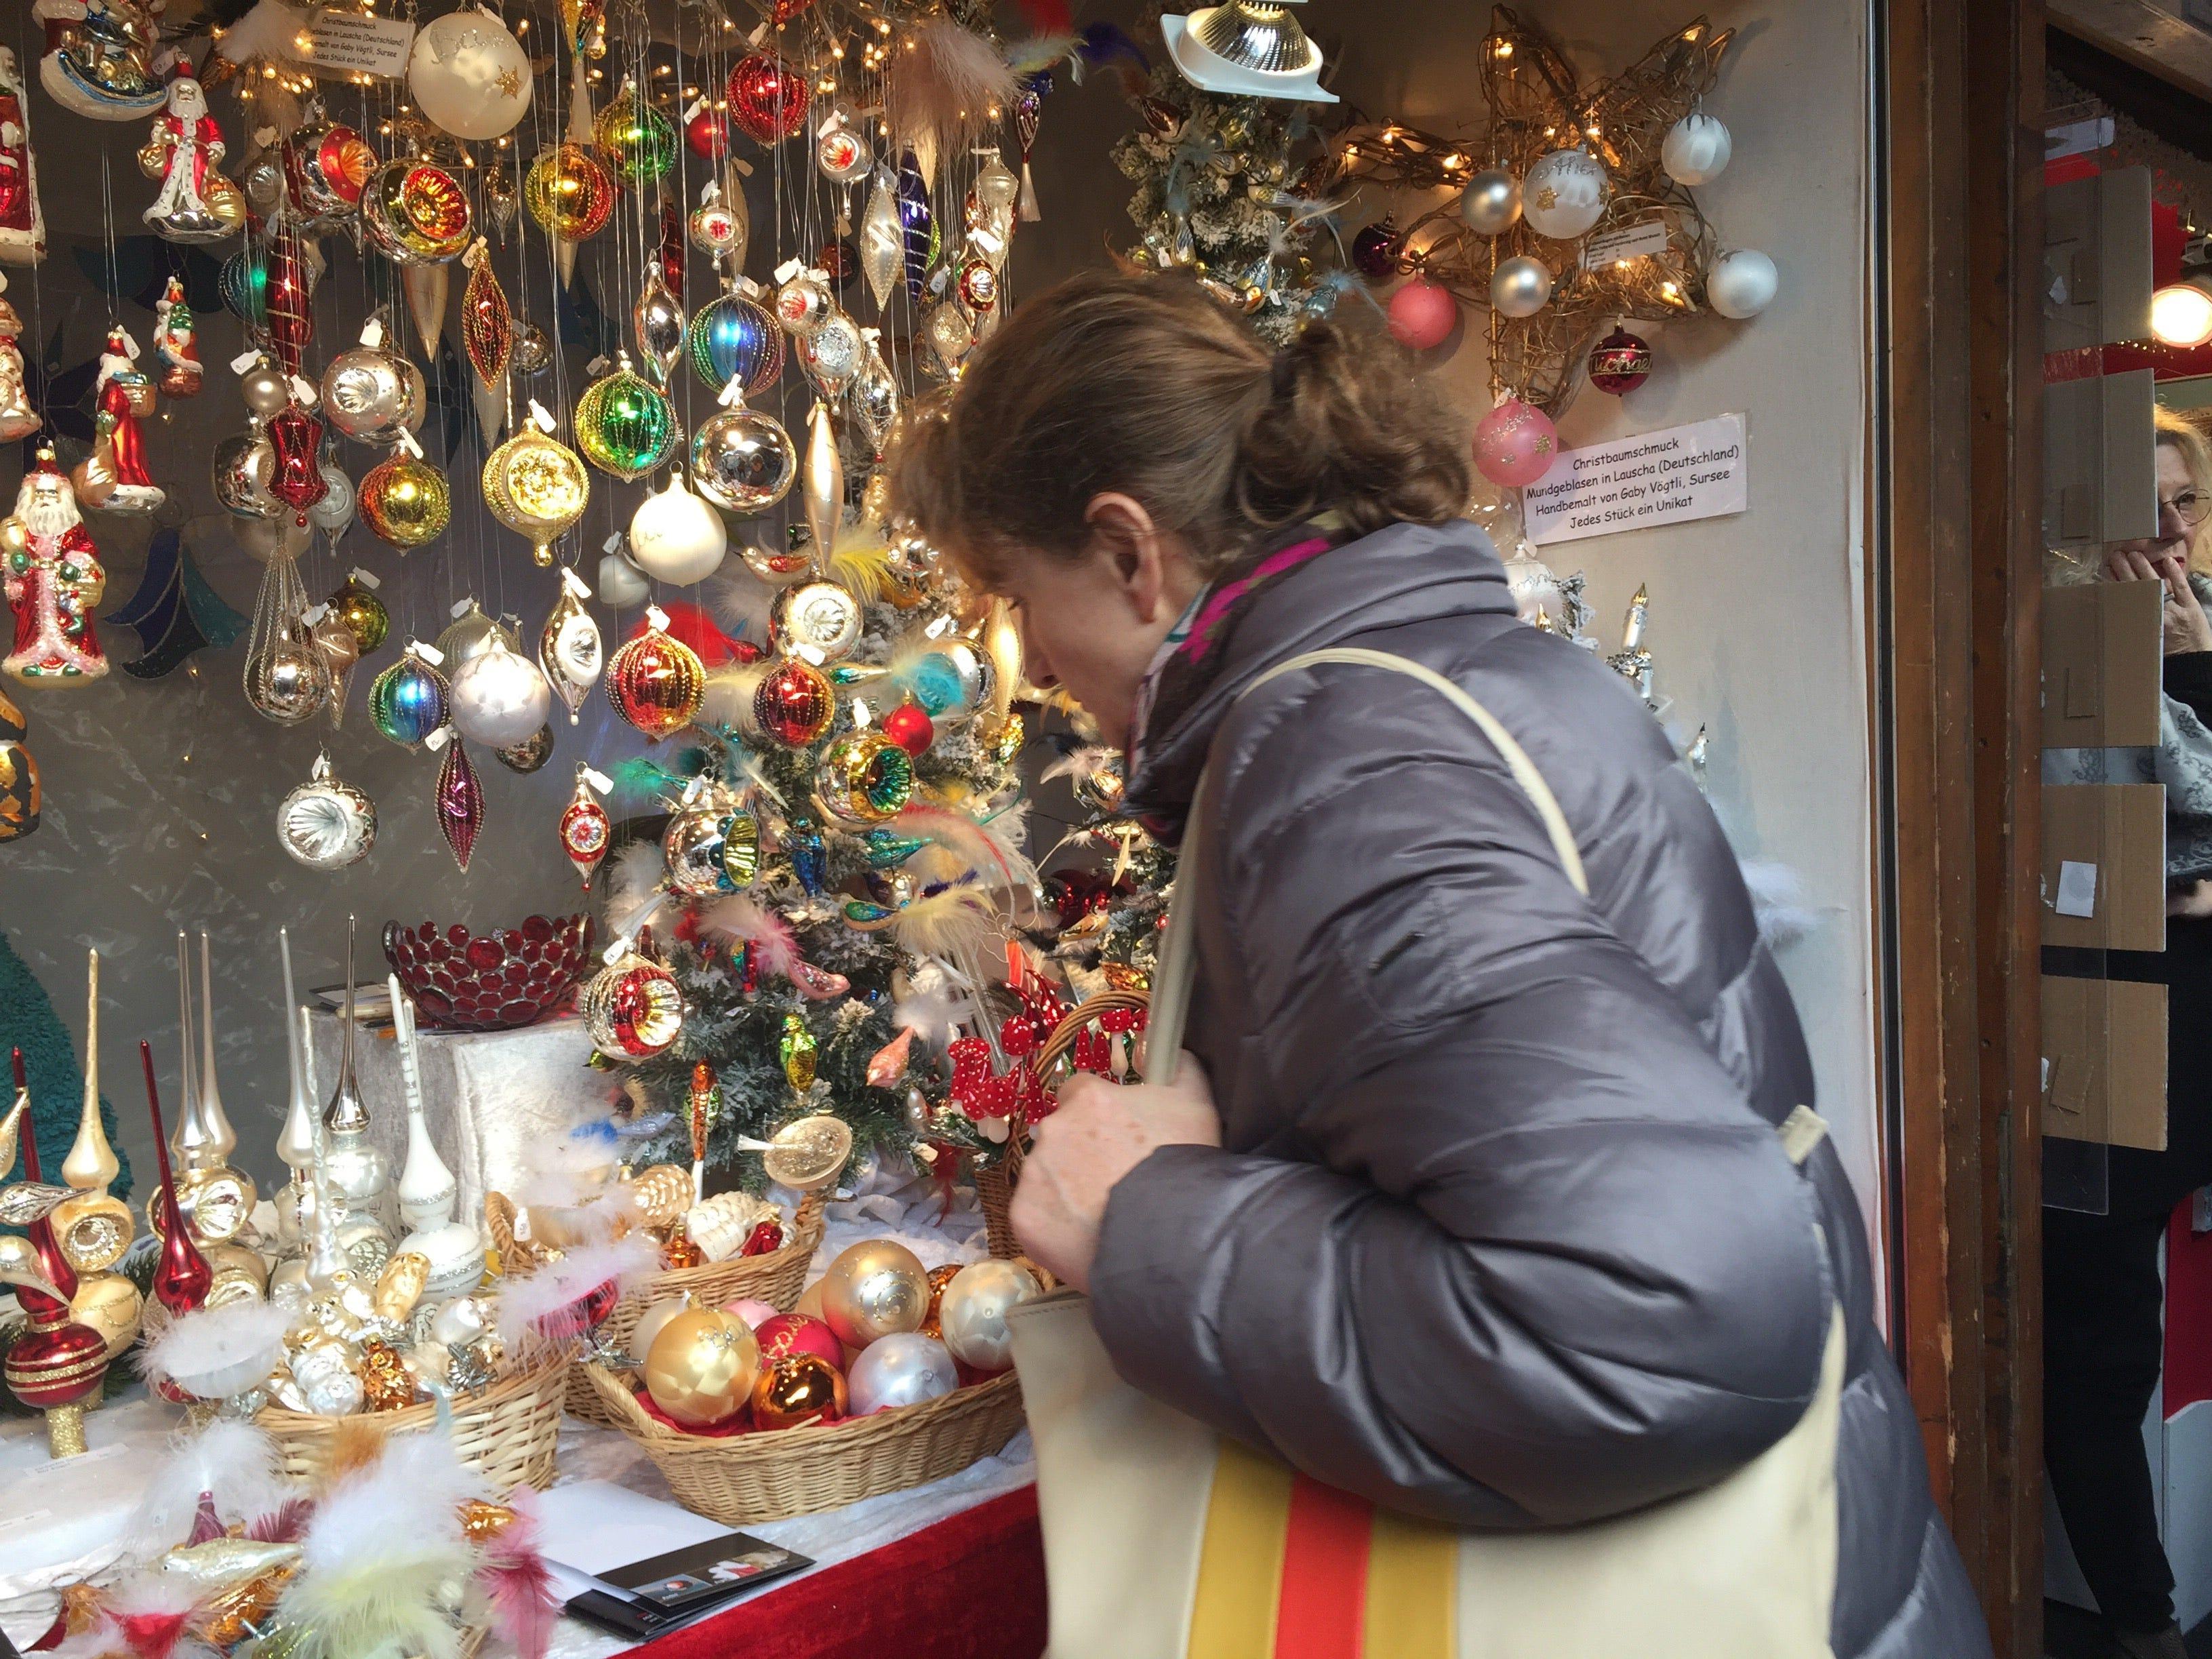 Shoppers admire hand-made tree ornaments at Barfüsserplatz.